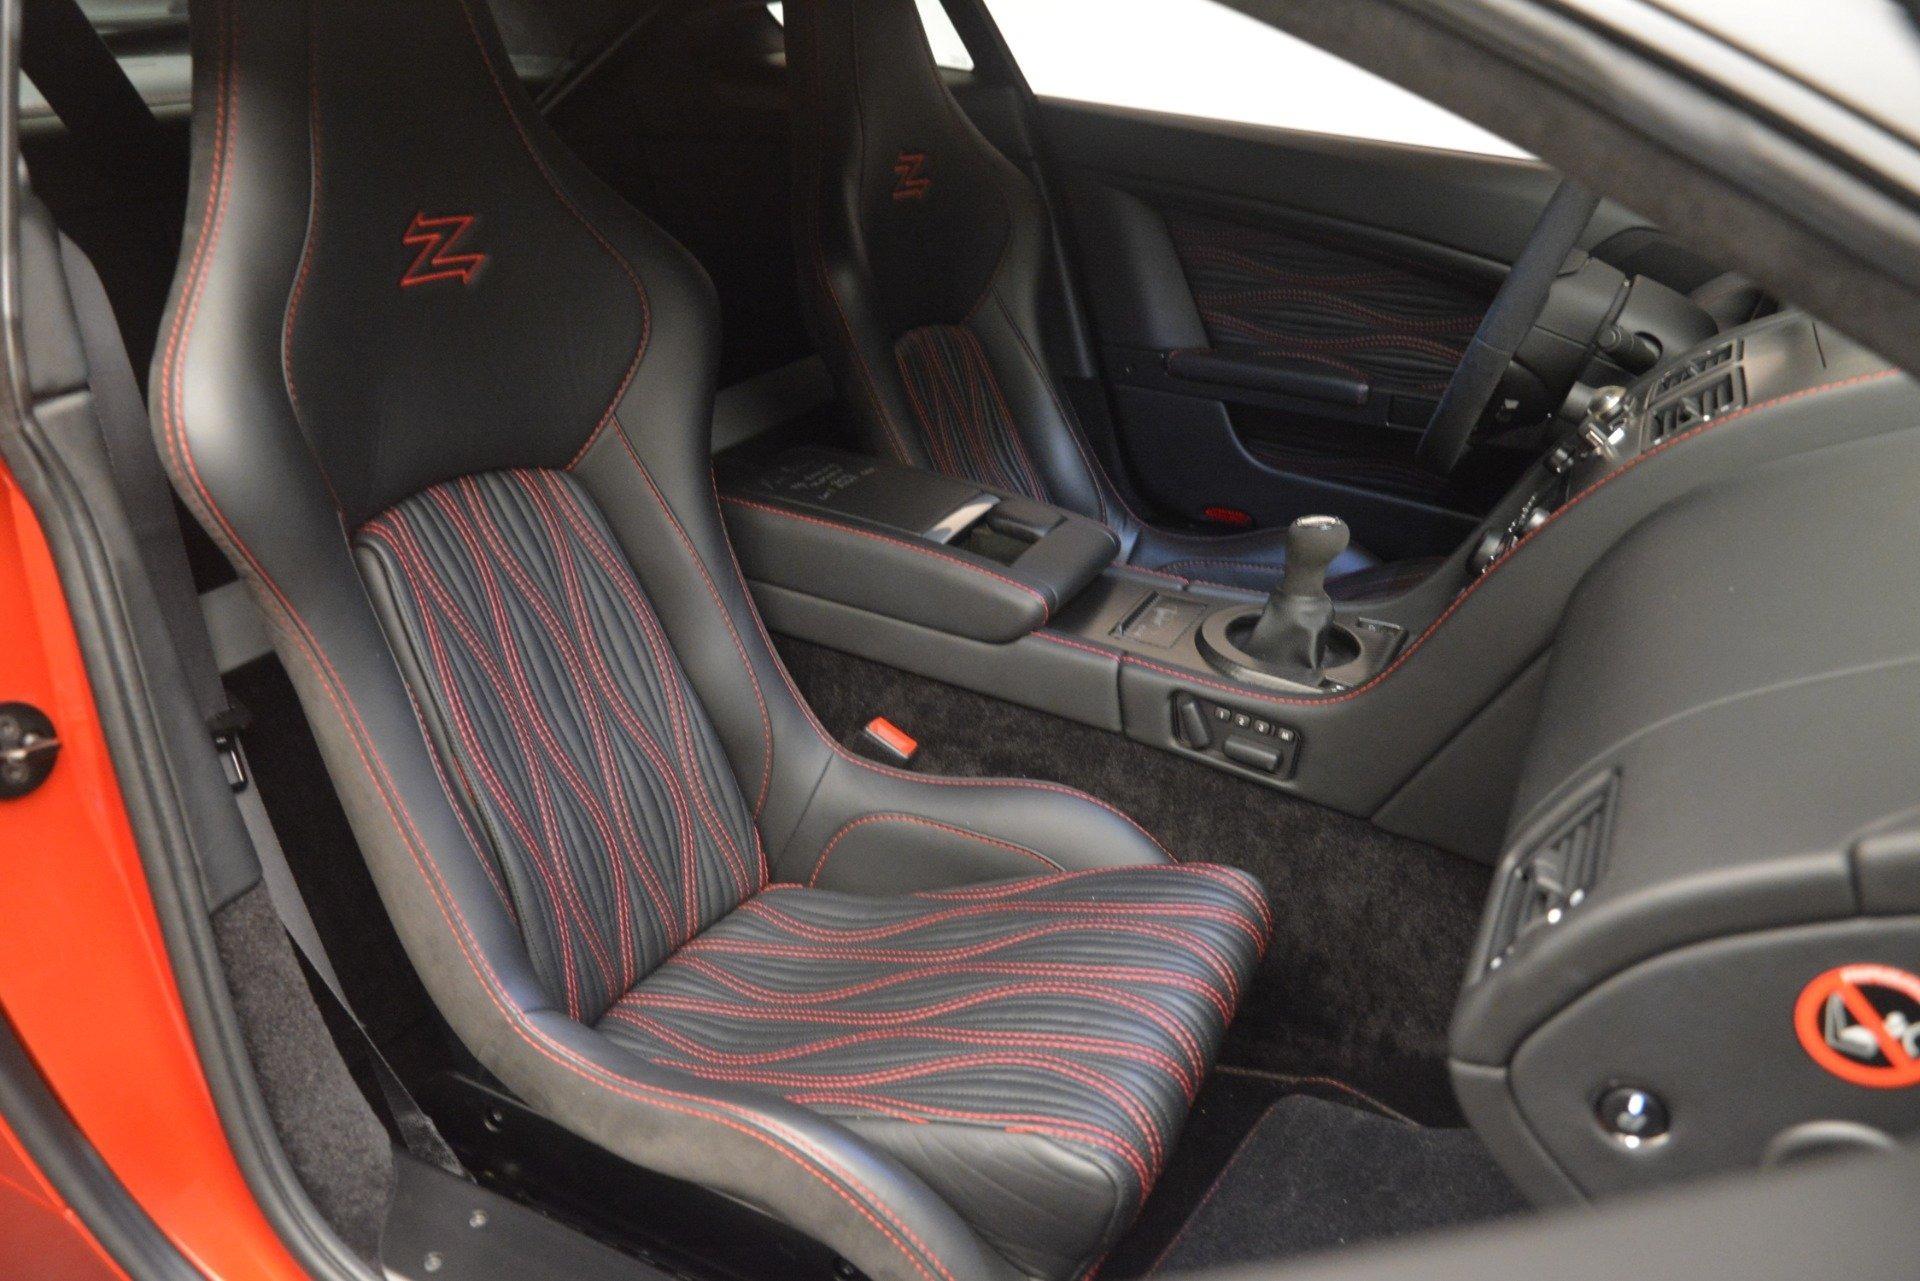 Used 2013 Aston Martin V12 Zagato Coupe For Sale In Westport, CT 3181_p20